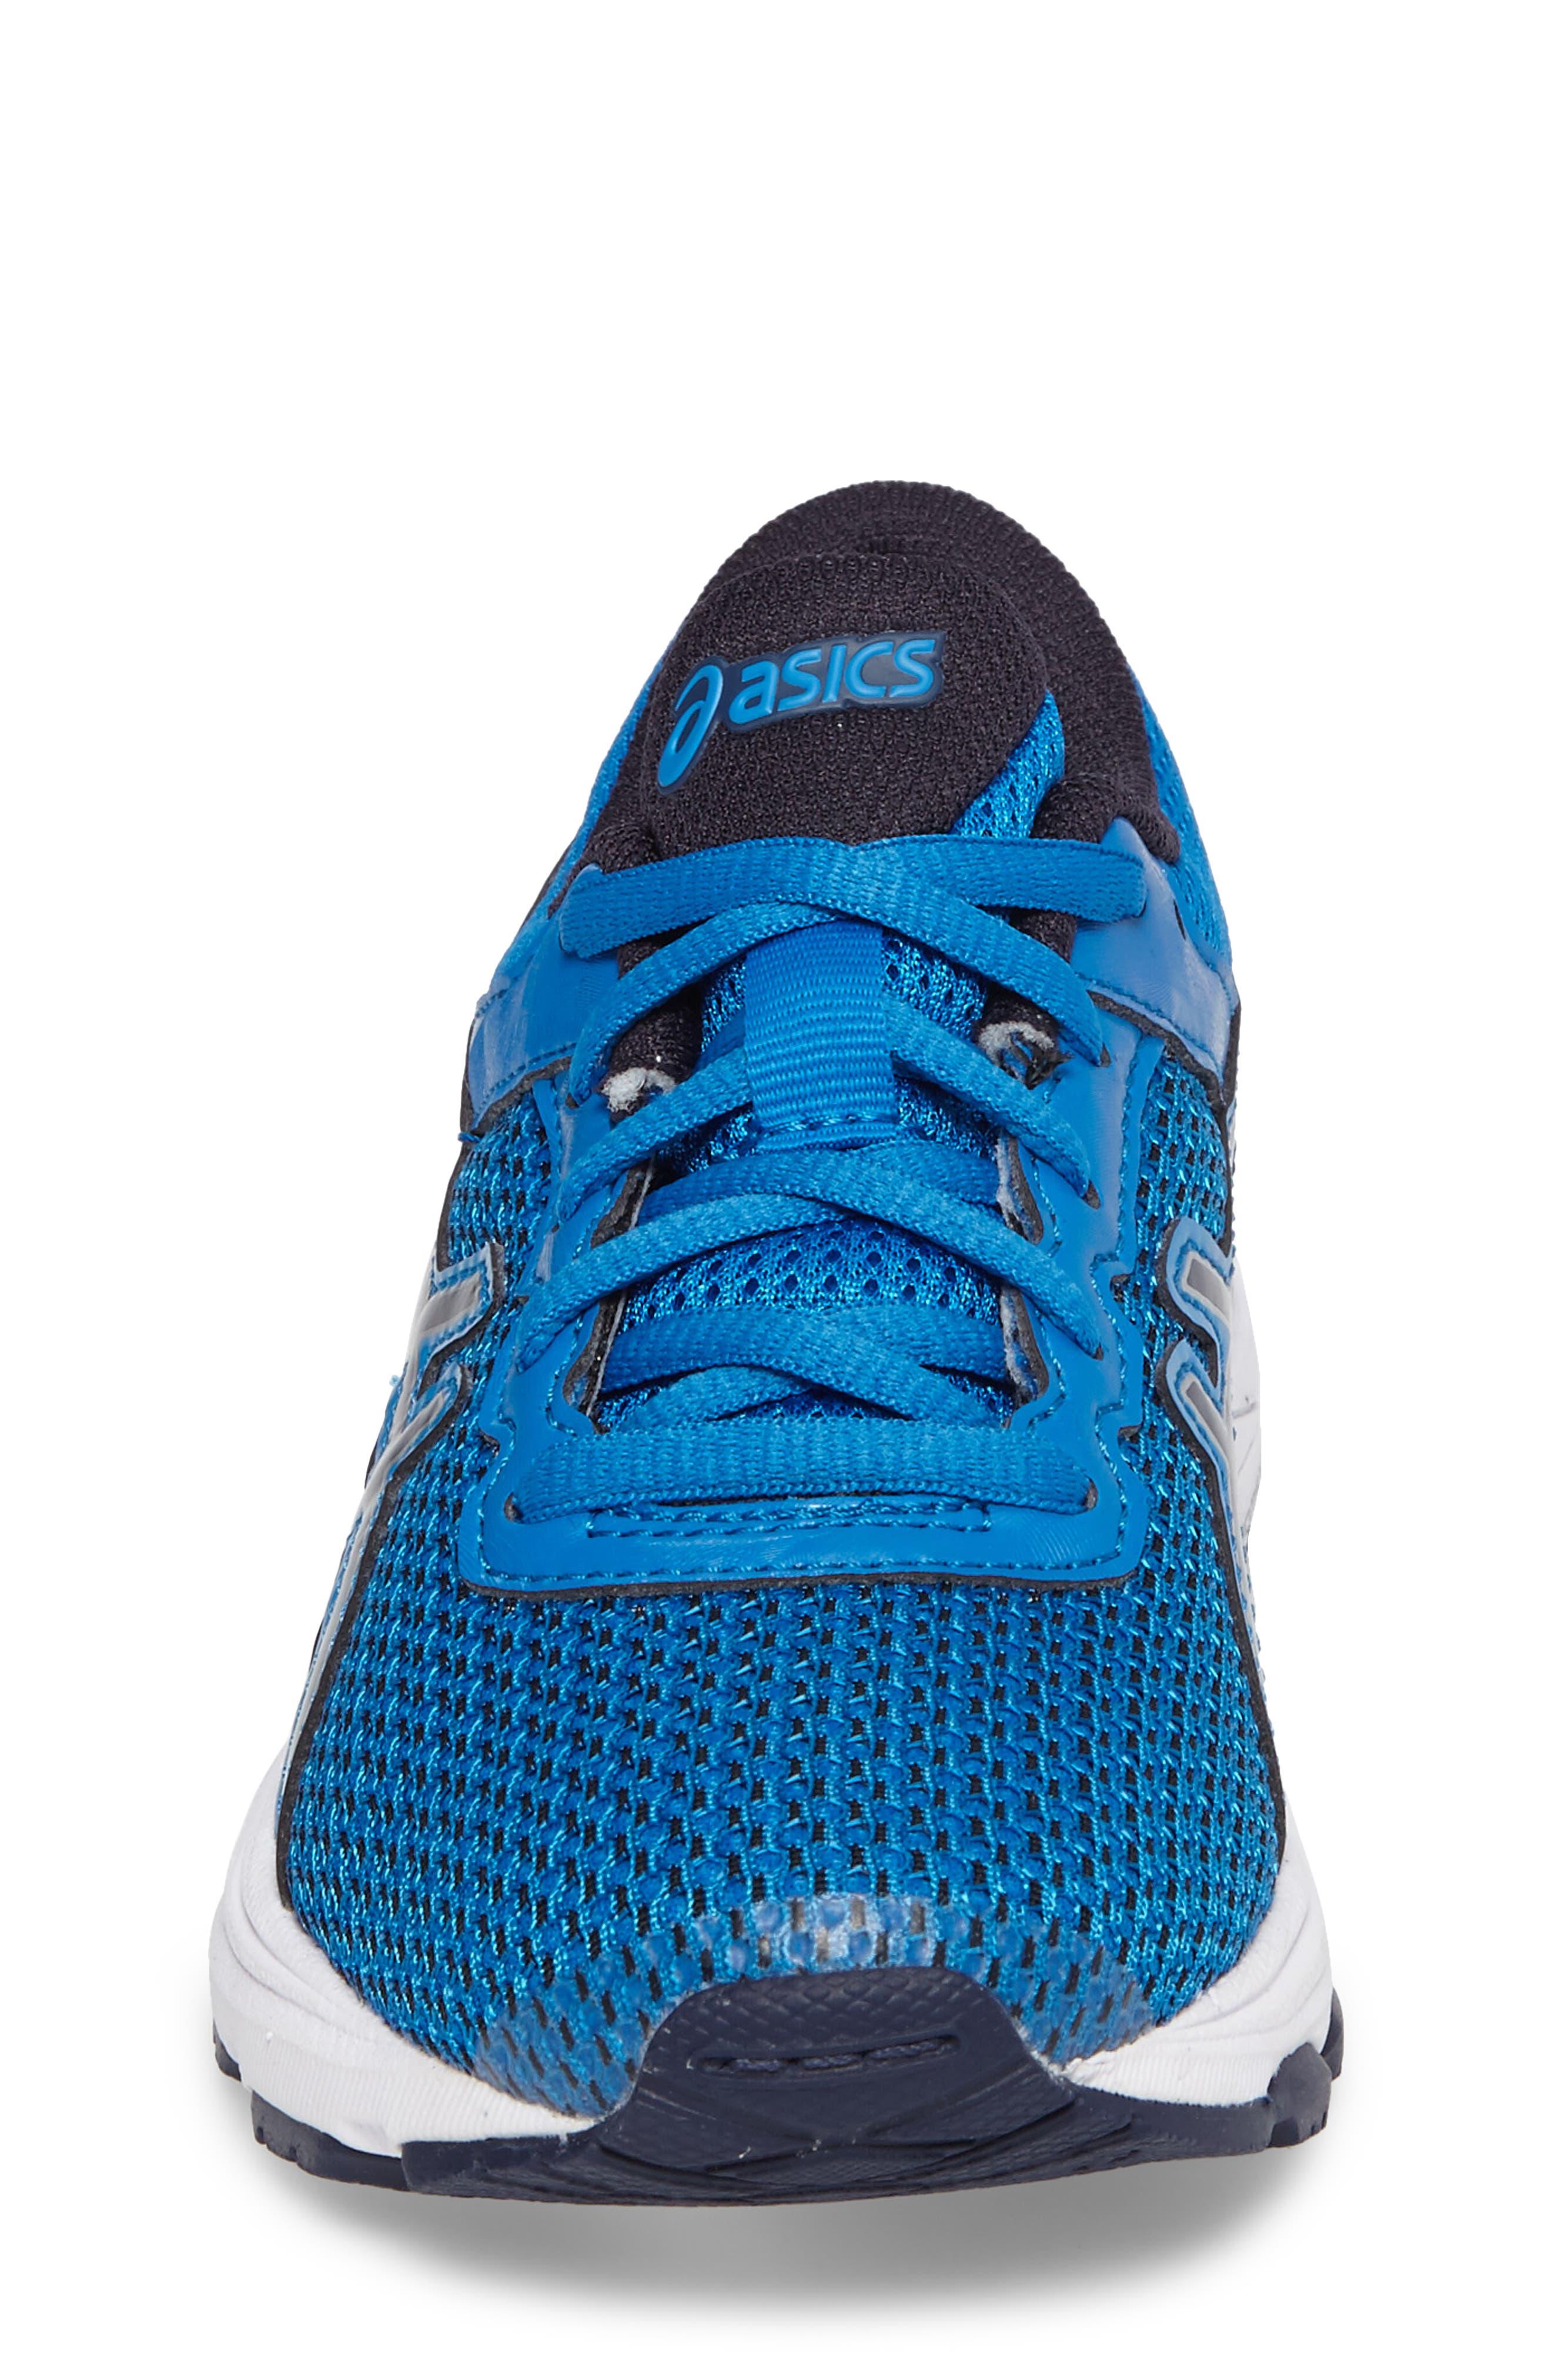 Asics GT-1000<sup>™</sup> 6 GS Sneaker,                             Alternate thumbnail 4, color,                             Blue/ Peacock